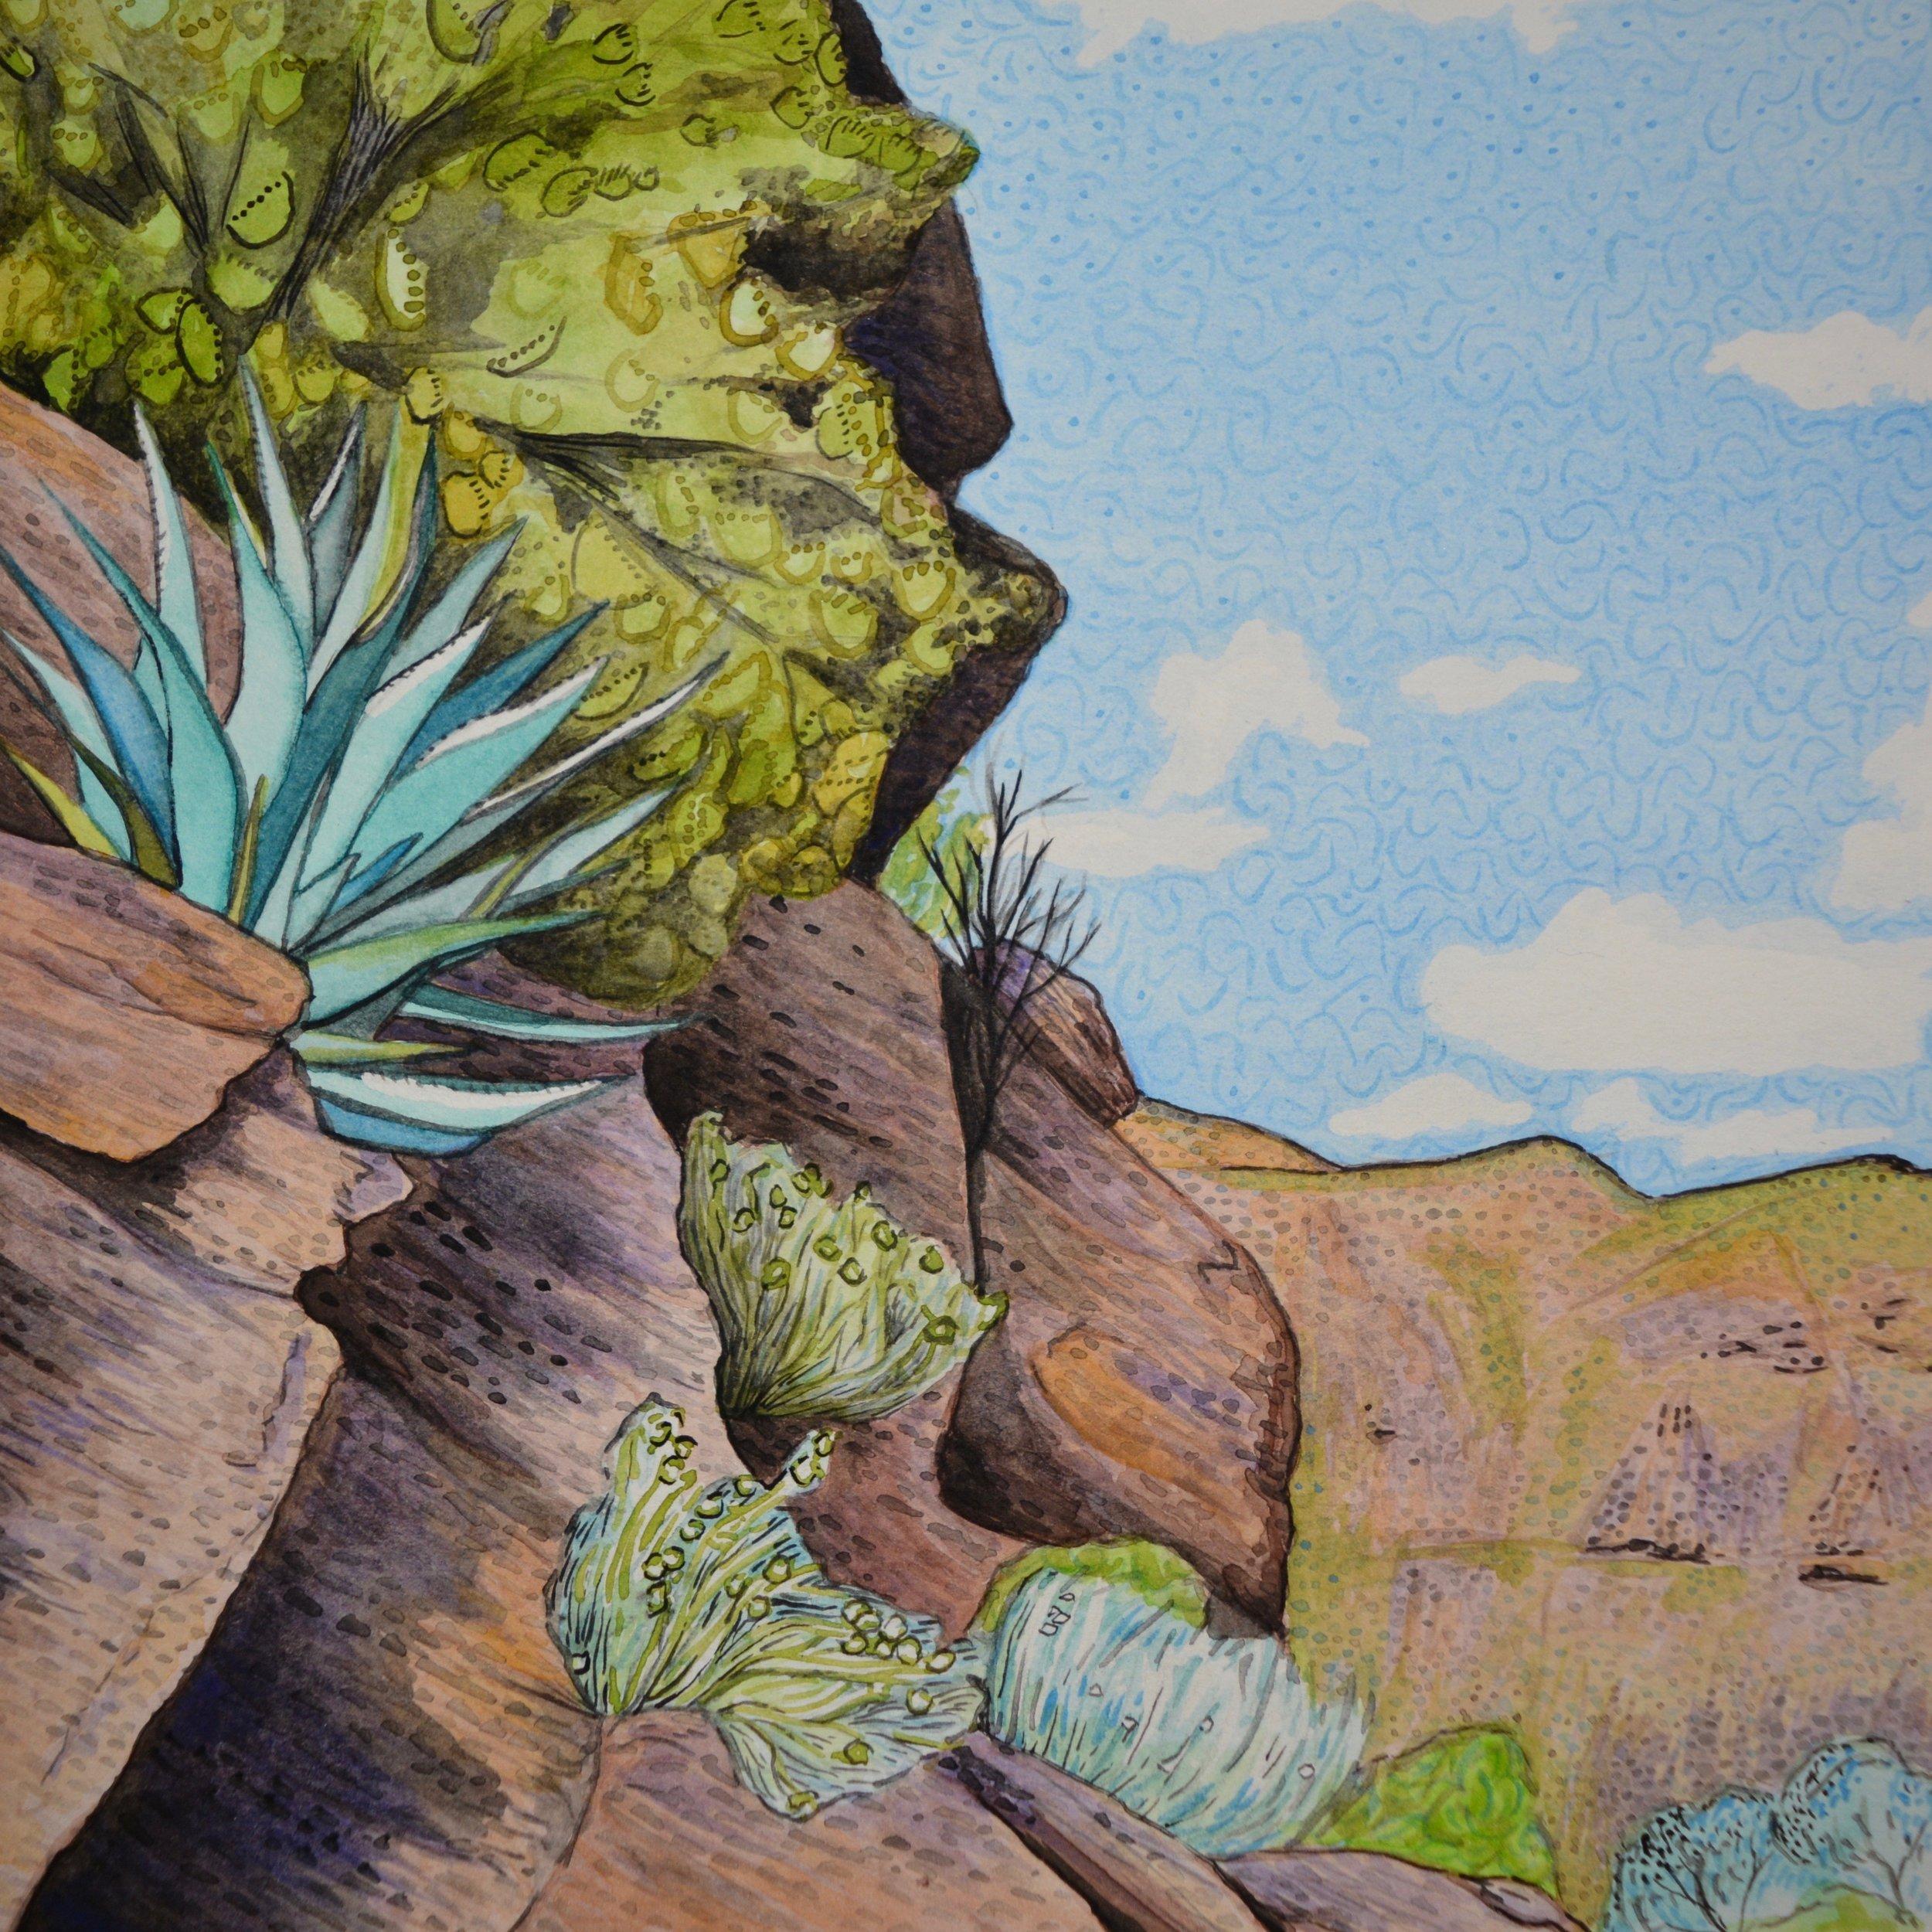 Organ Pipe Cactus National Monument, Arizona: 1/24/17, 14:20:29